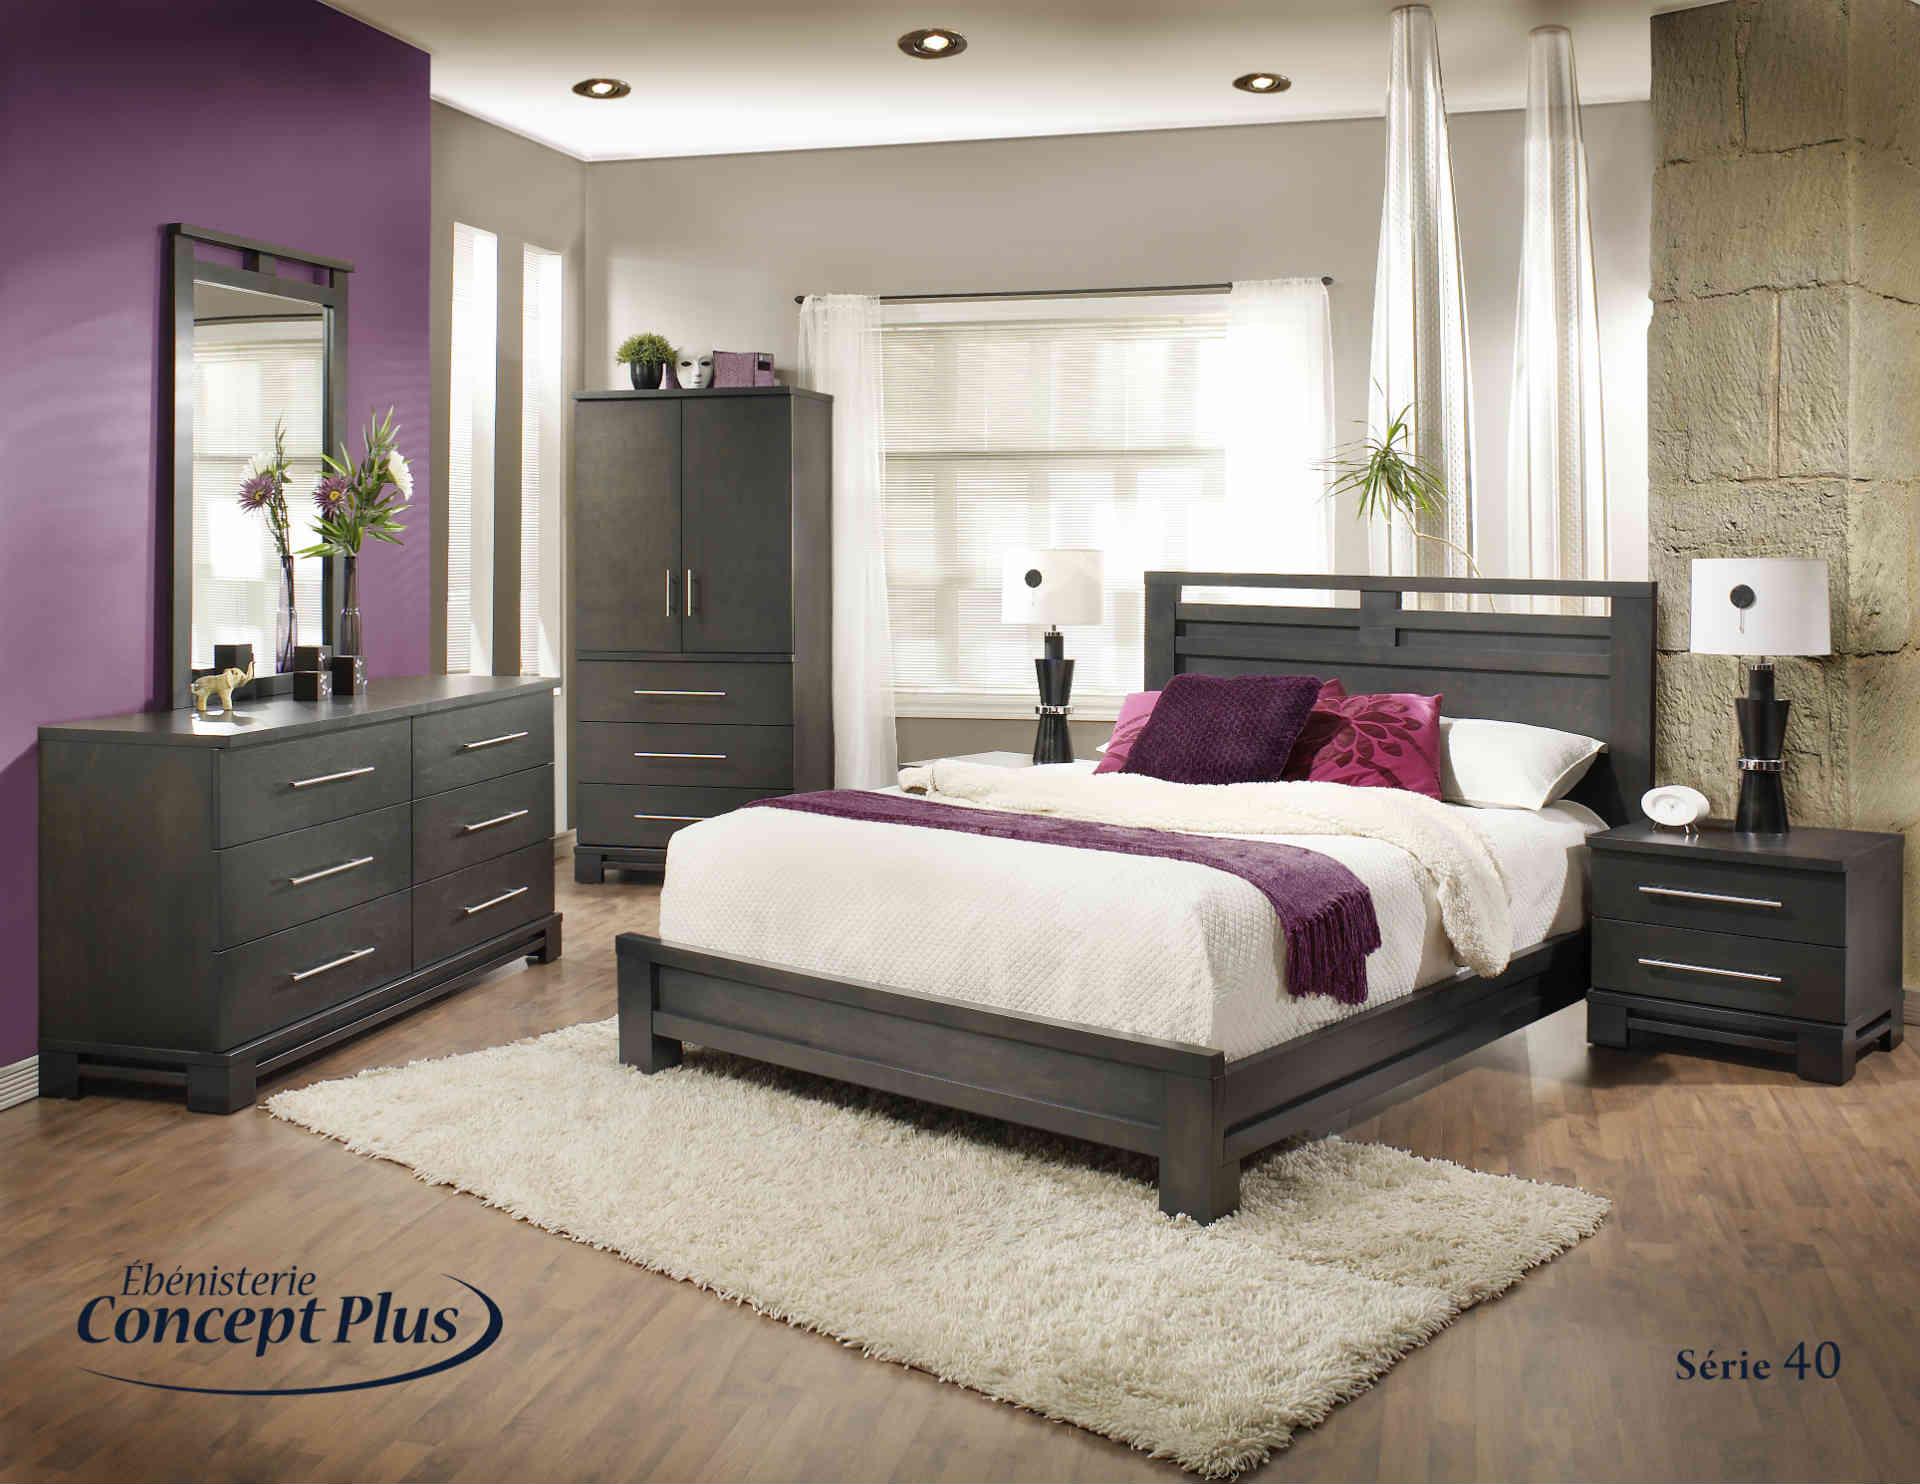 Meuble pour chambre a coucher chambre a coucher for Petit meuble chambre a coucher